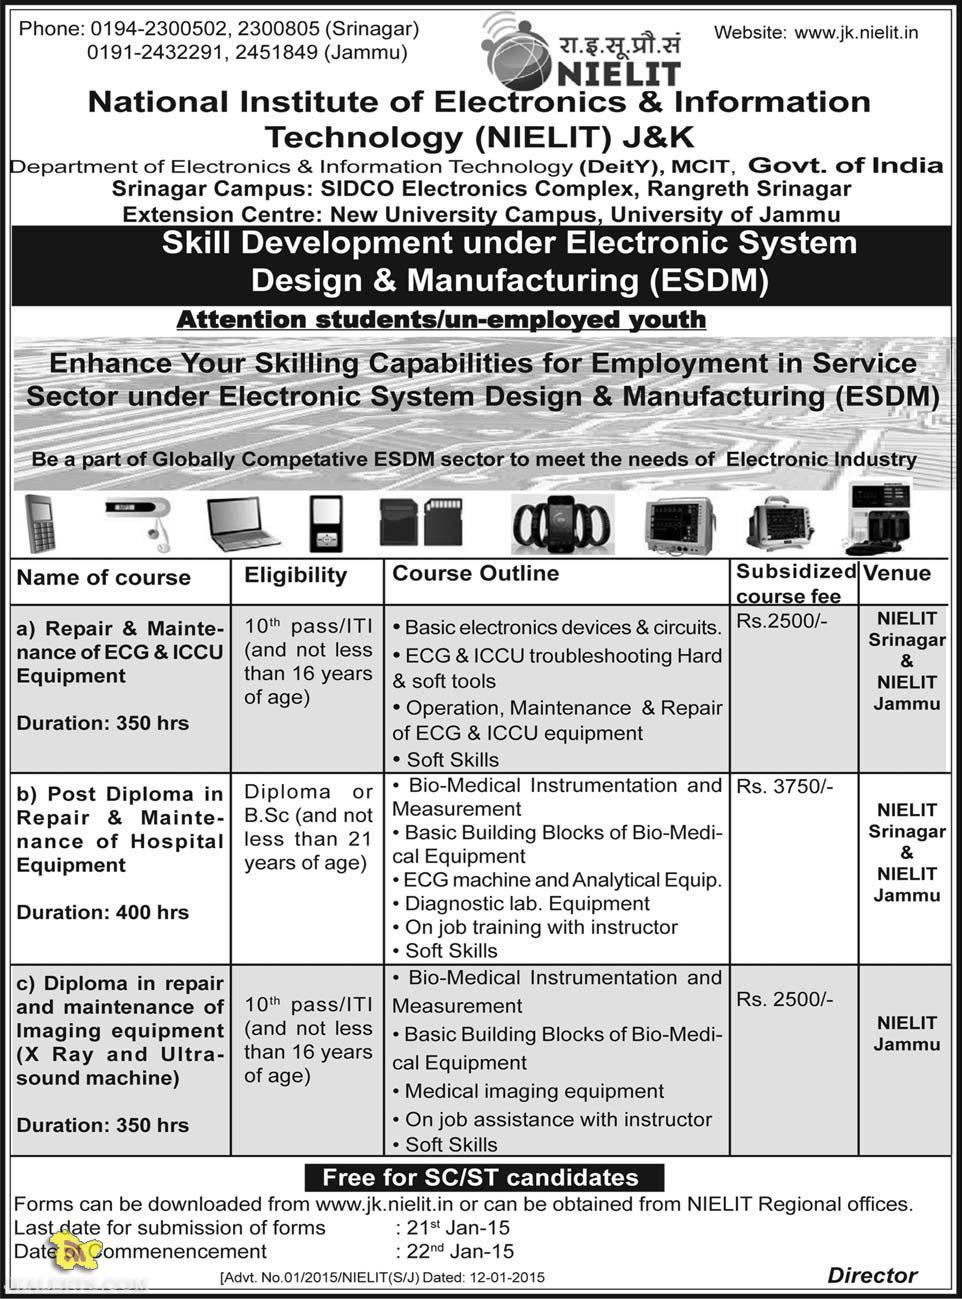 NIELIT Skill Development under Electronic System Design & Manufacturing (ESDM)